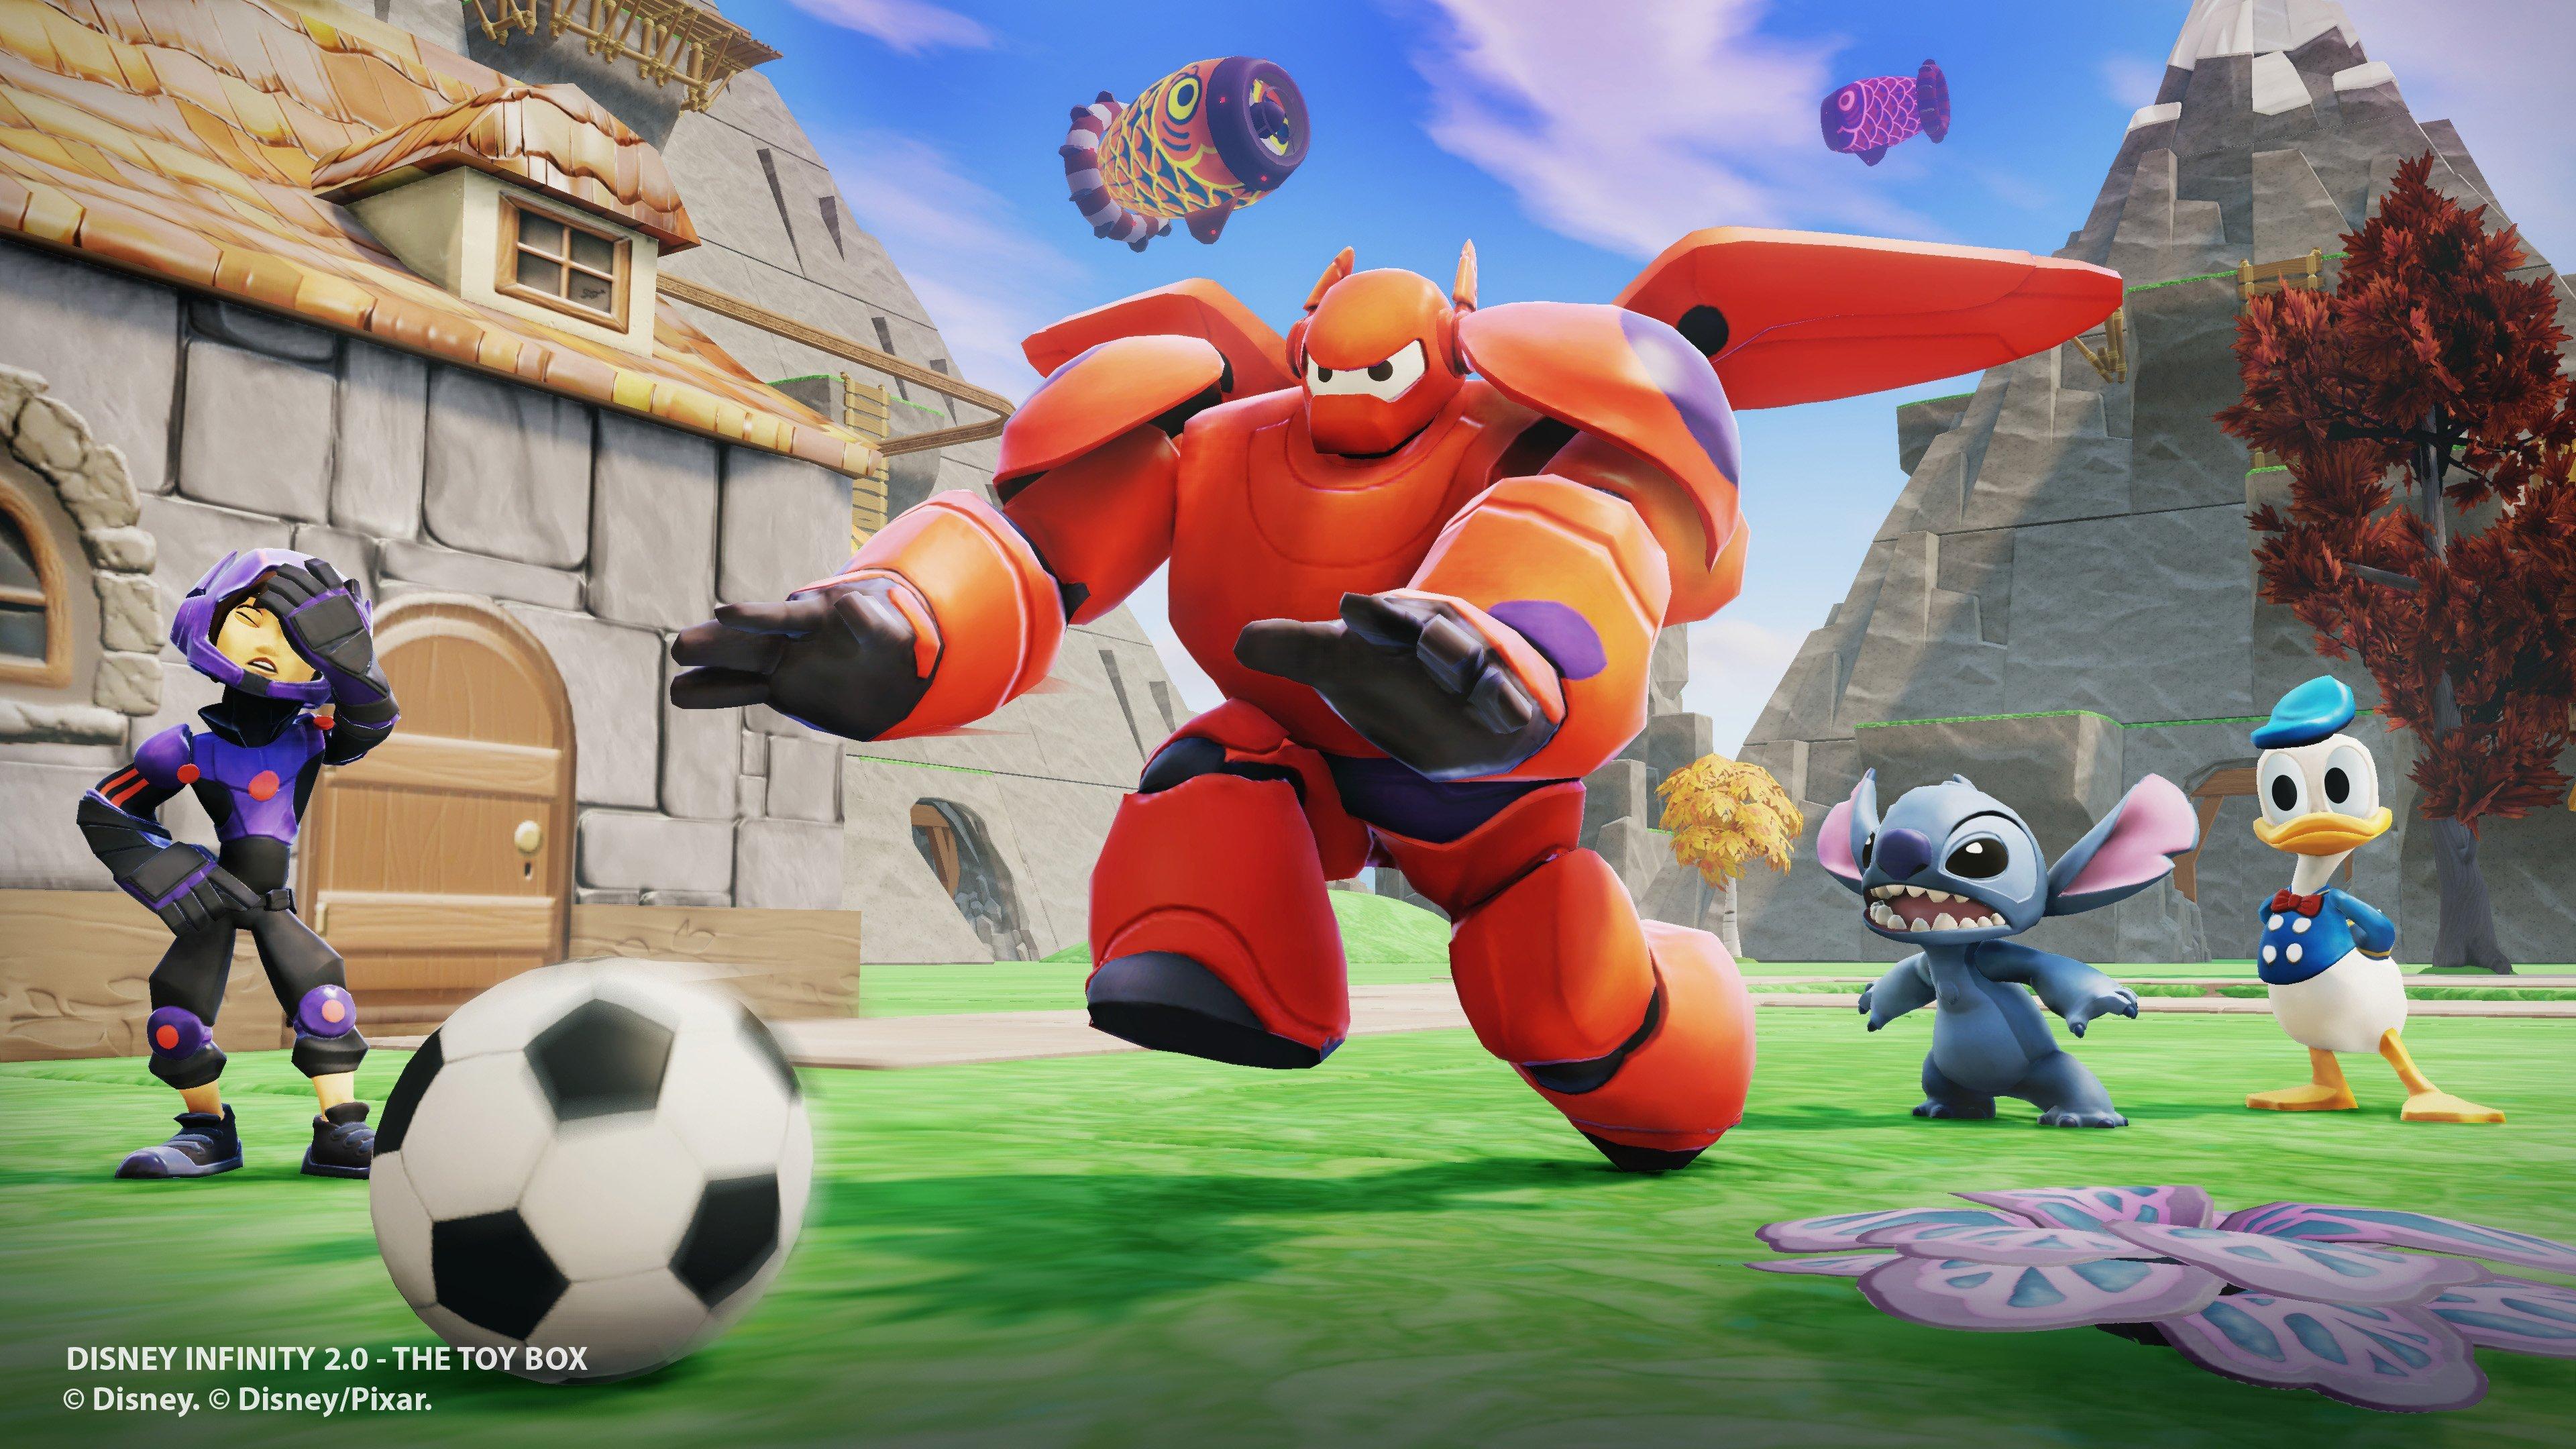 BIG HERO 6 Animation Action Adventure Family Robot Cgi Superhero Big Hero Disney Wallpaper